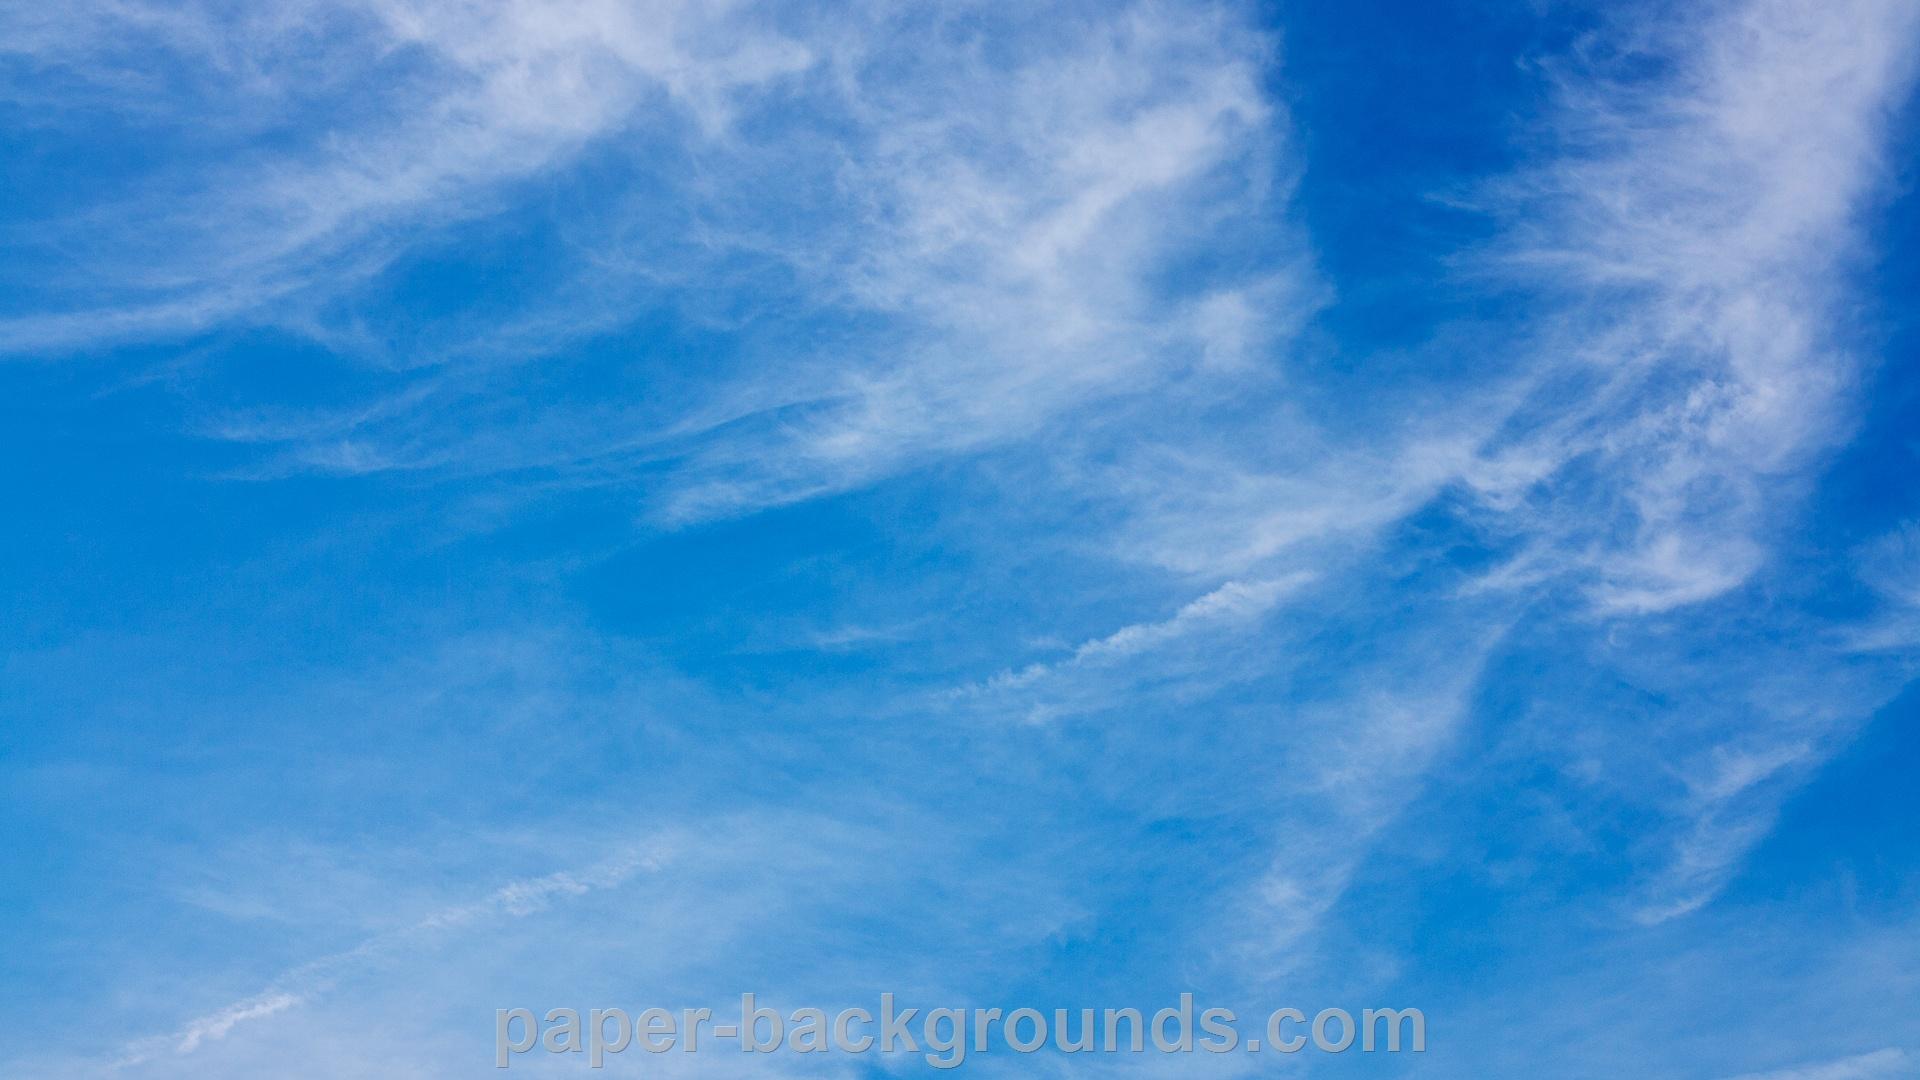 background sky blue ground back textureimages 1920x1080